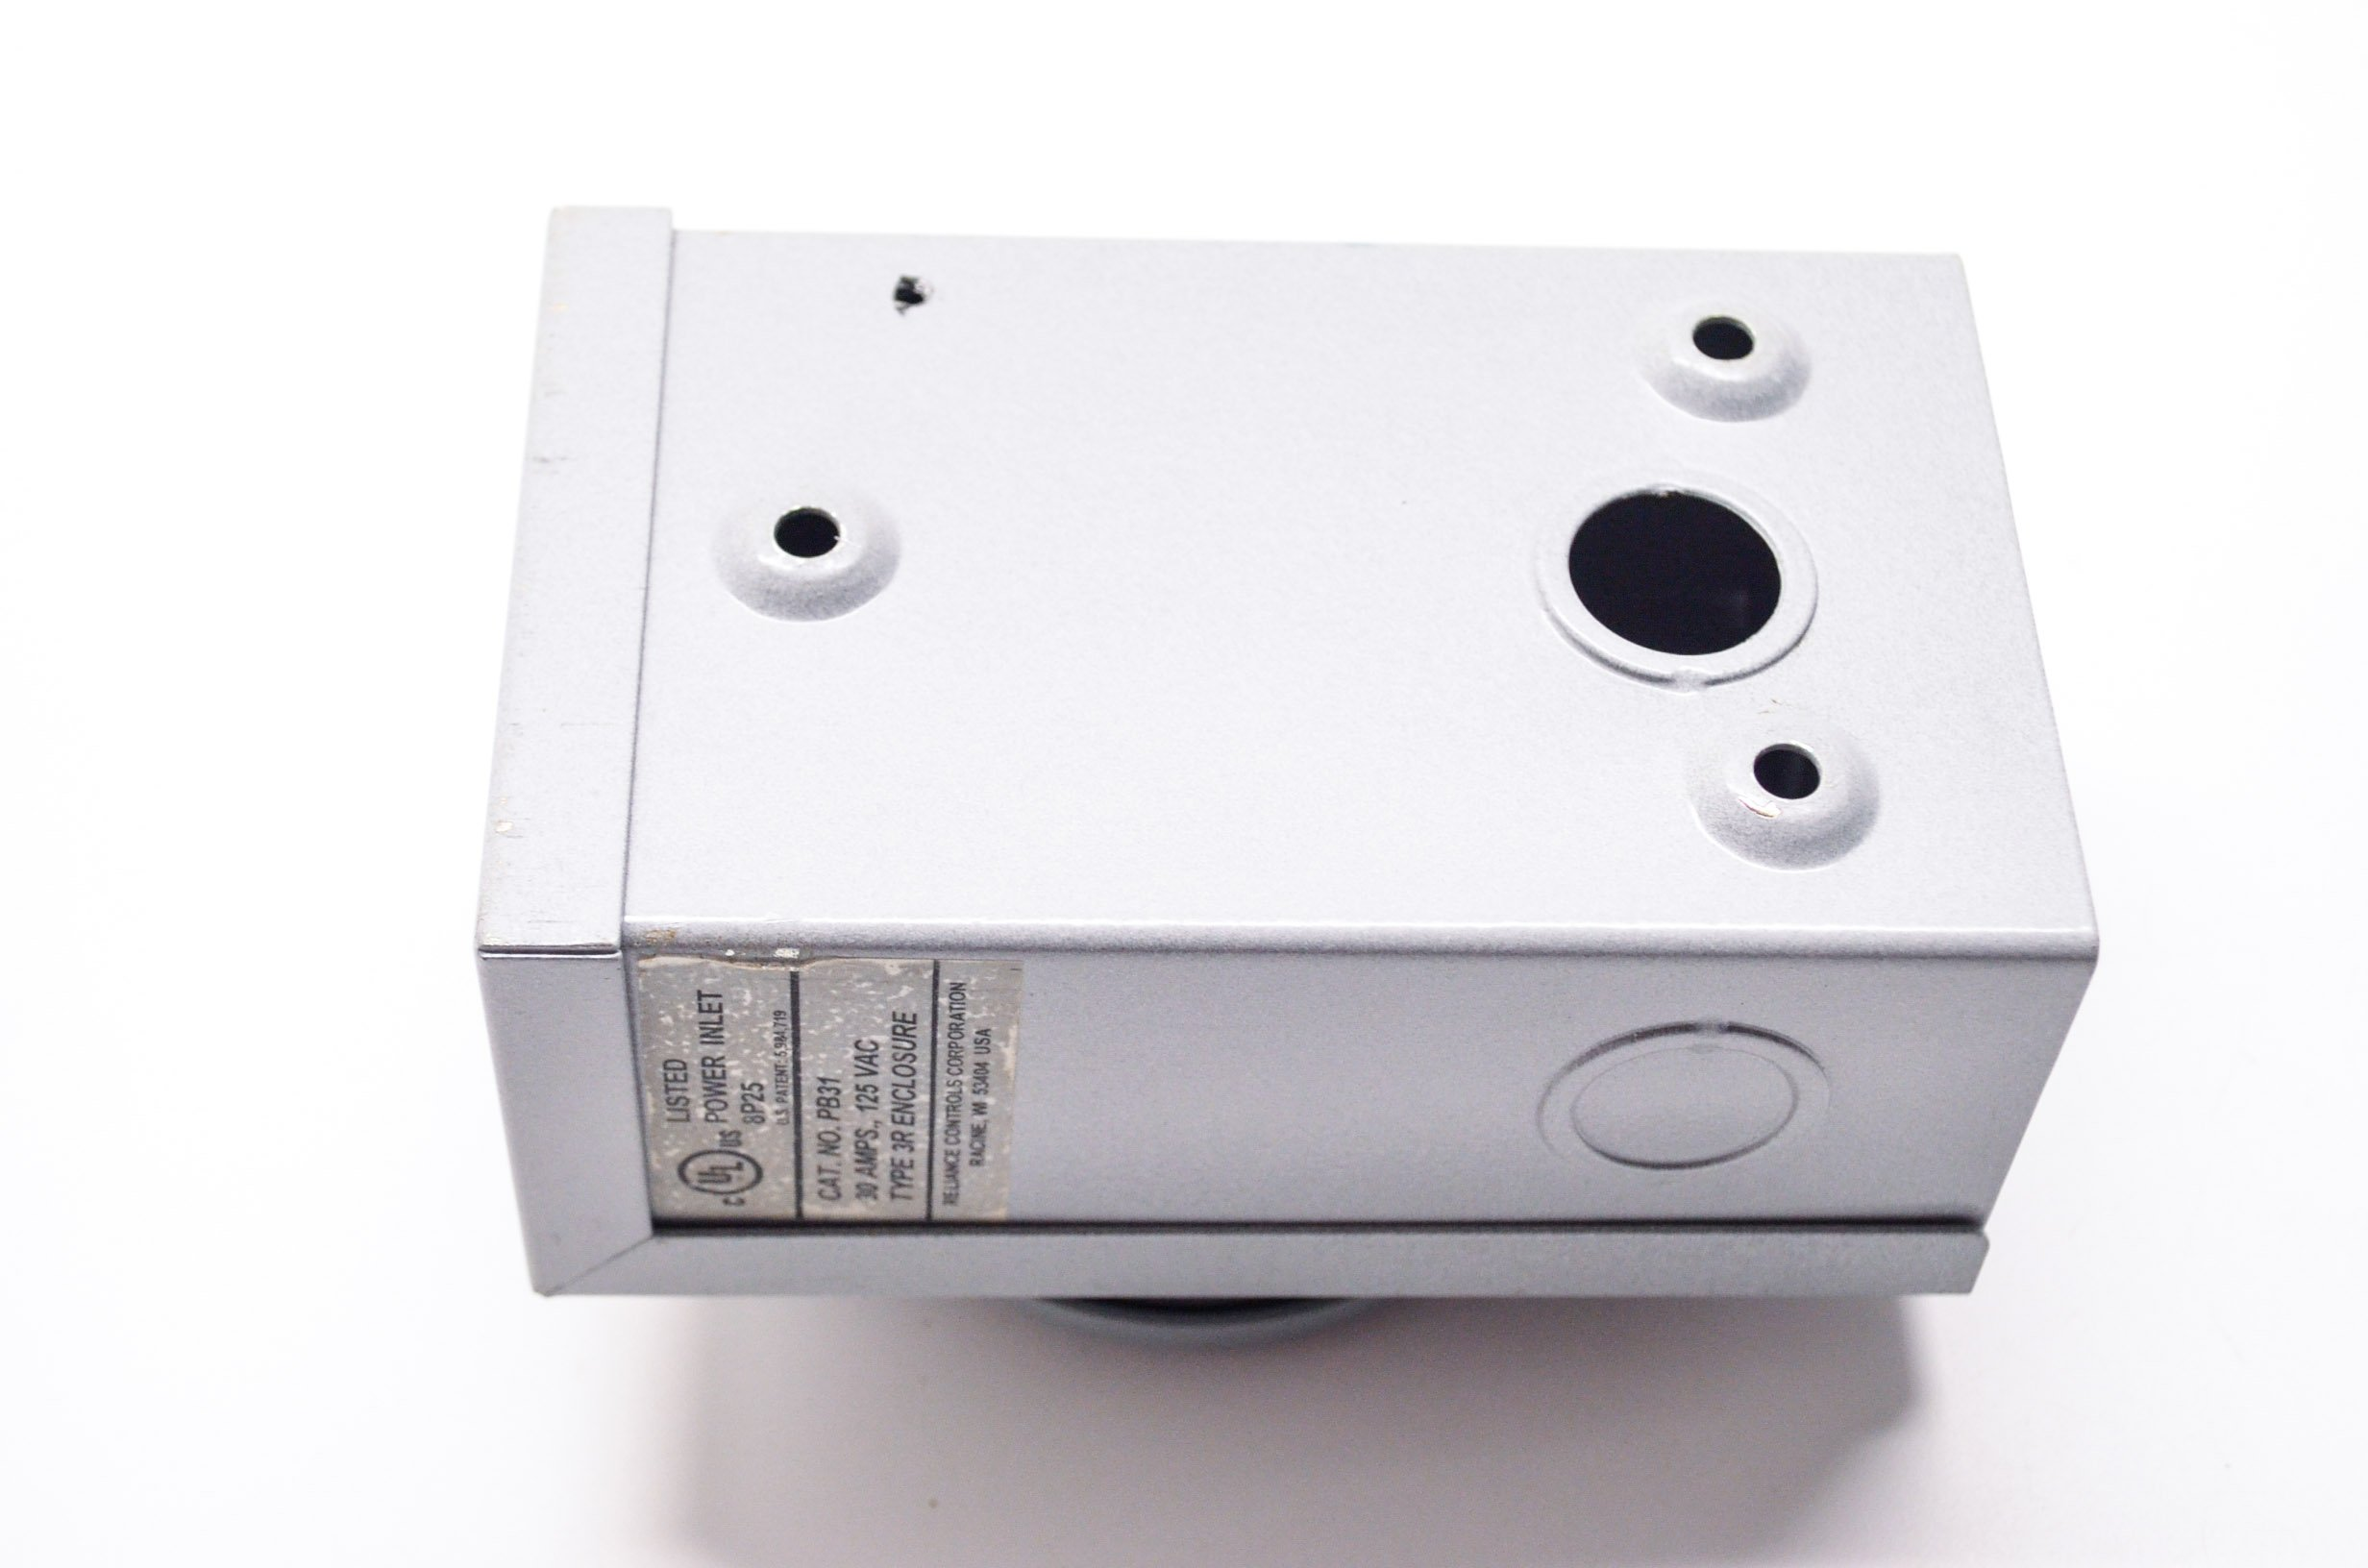 Honda 32316-189-PB31 Pwr Inlet Box,L5-30; 32316189PB31 Made by Honda by Honda (Image #2)